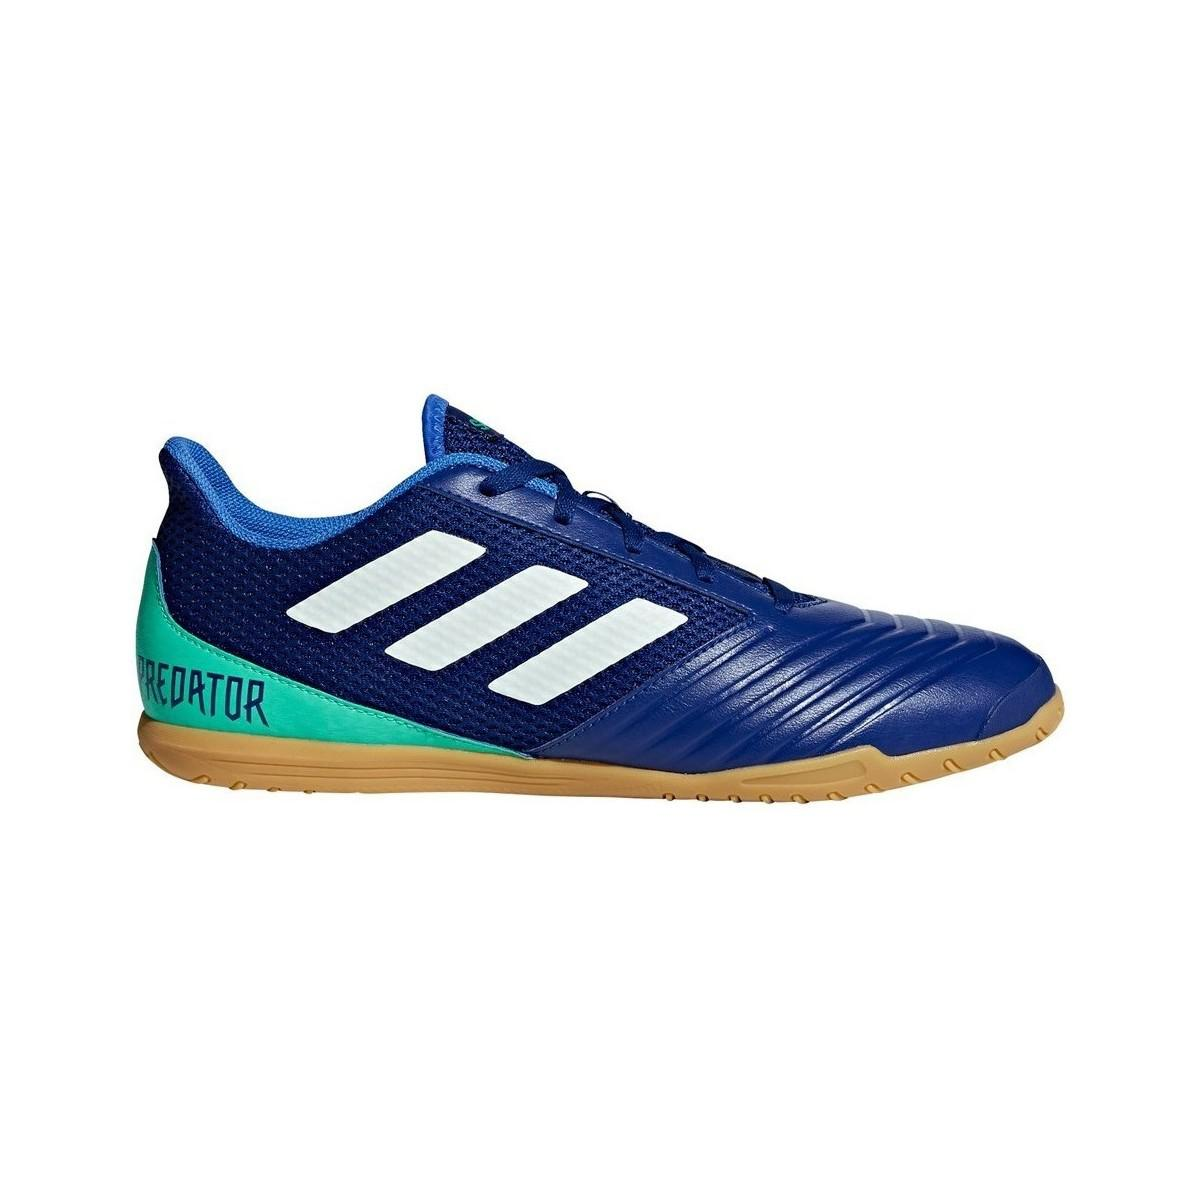 666a93f0e View fullscreen  official photos 9db11 603b9 adidas Predator Tango 184 Sala  Mens Football Boots In Multic